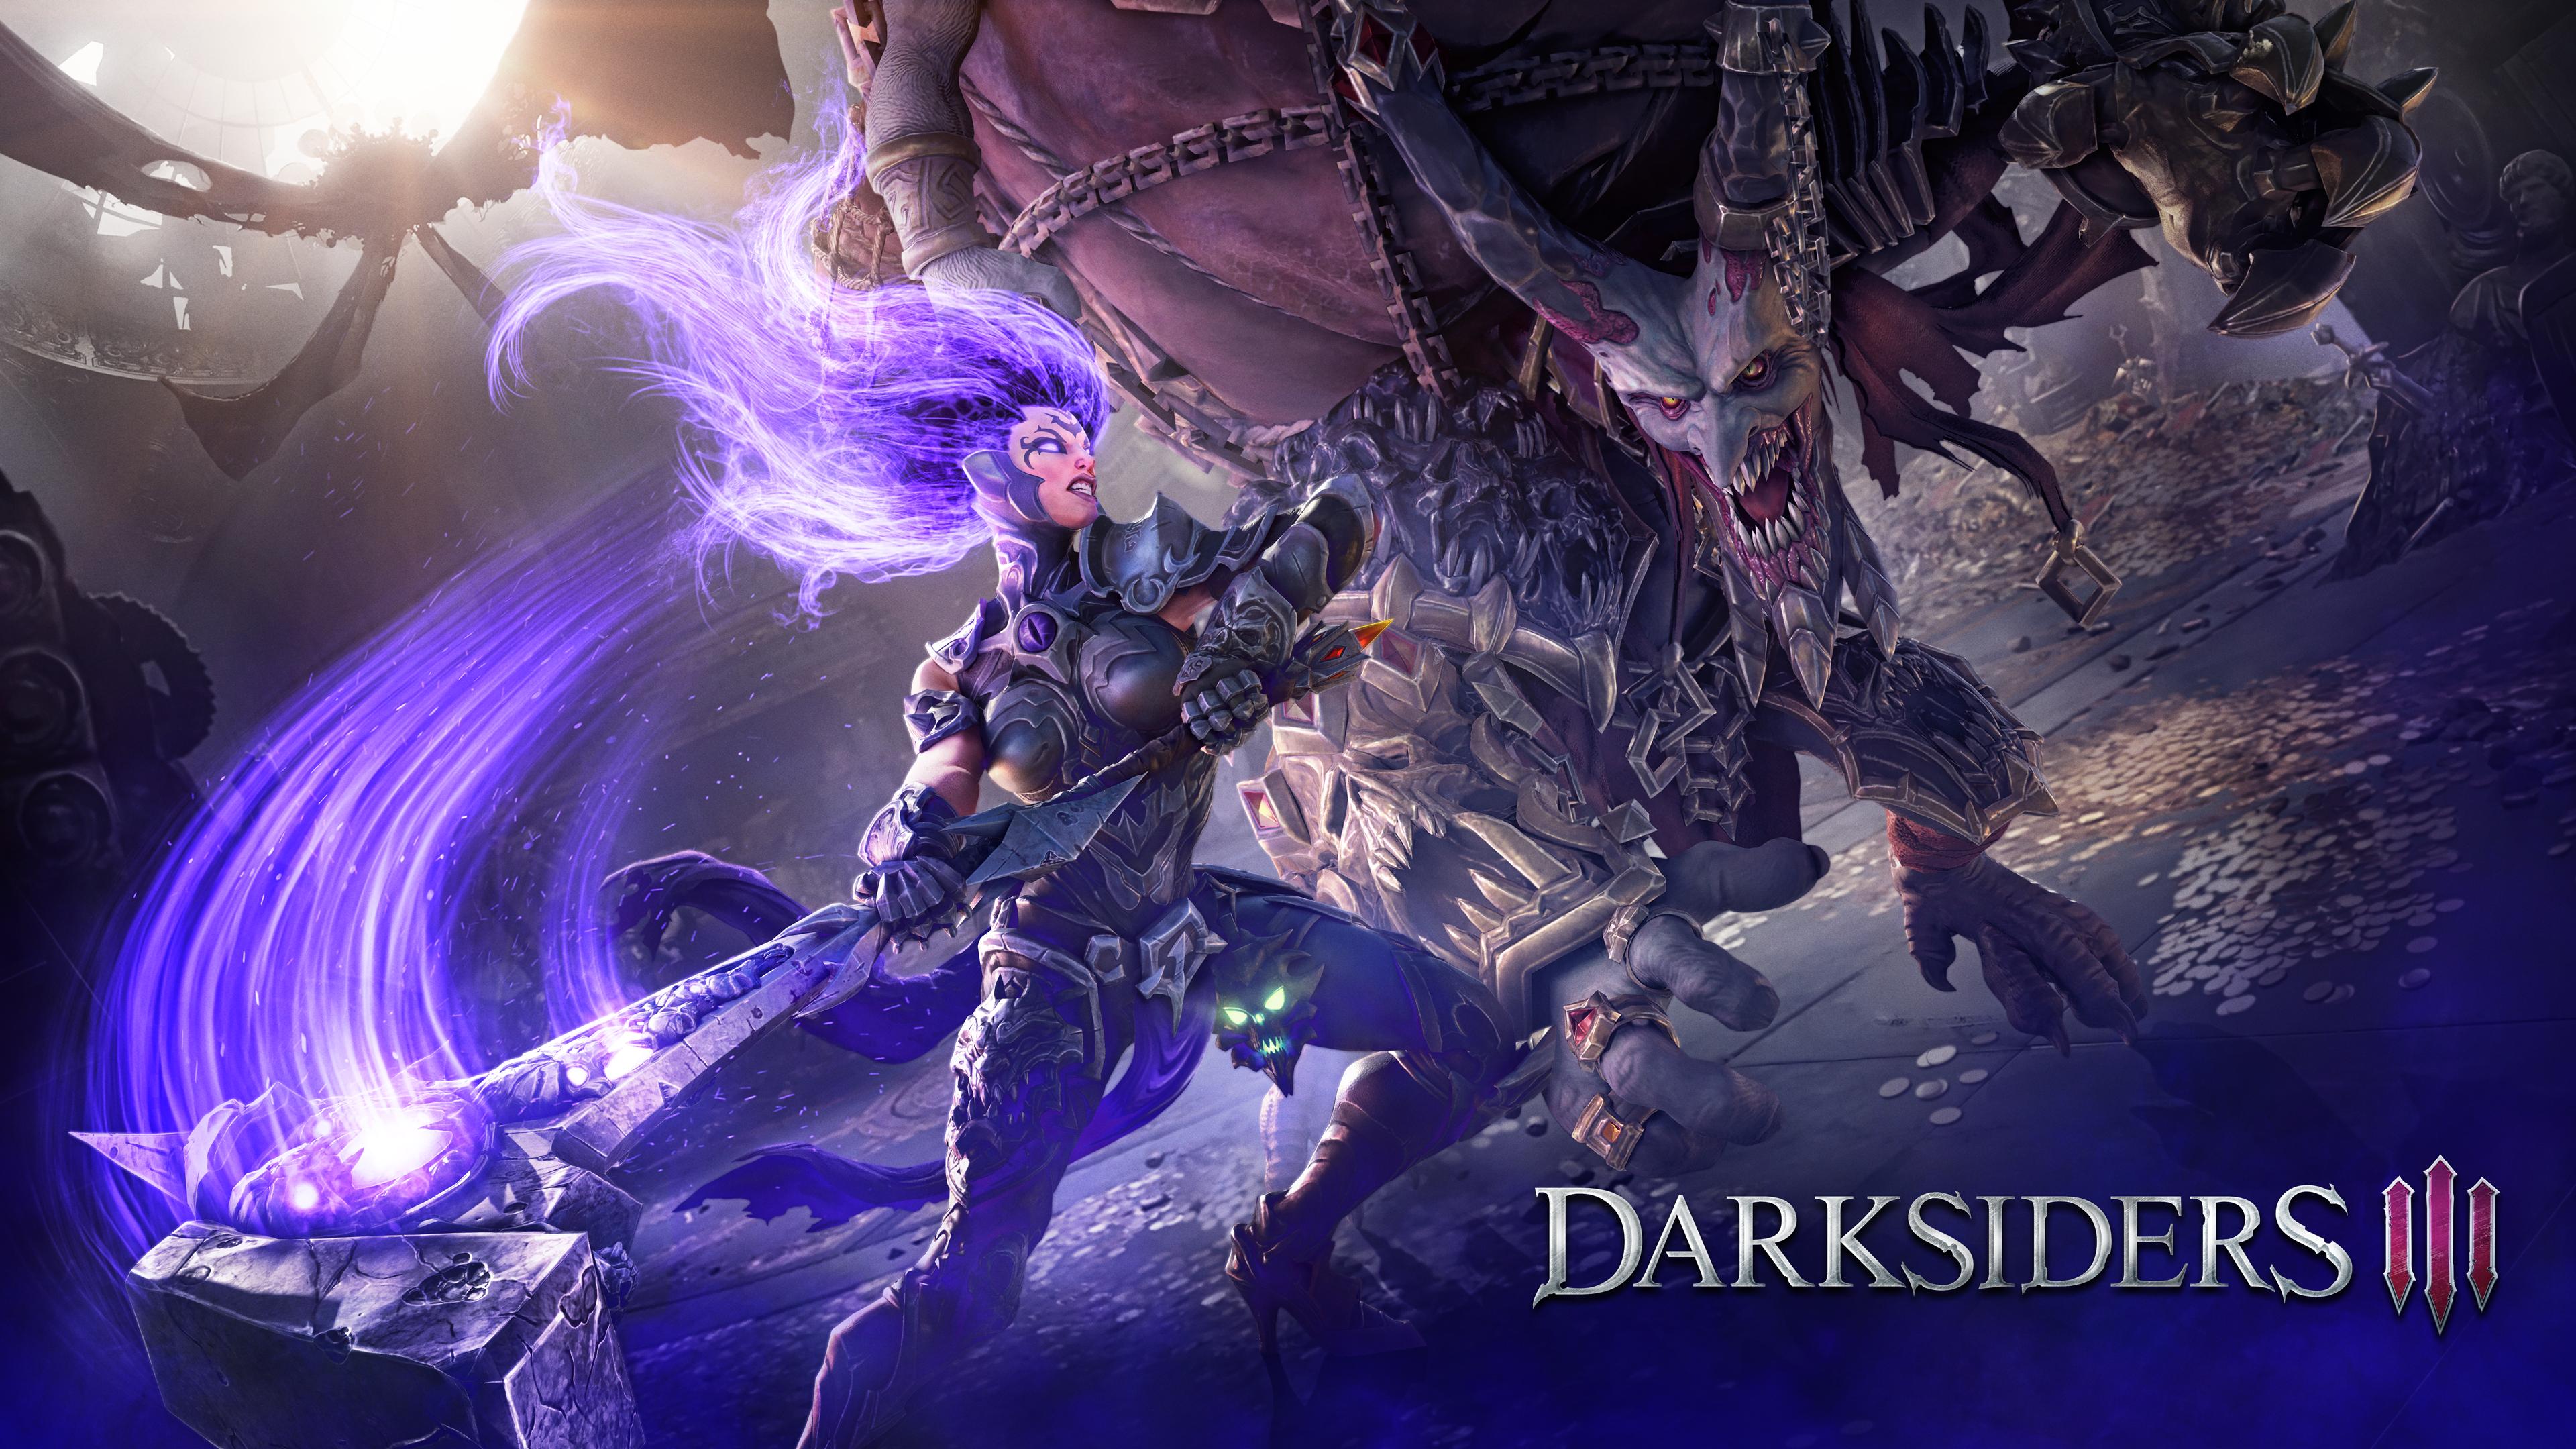 Darksiders III Enhancement Locations: every essence of